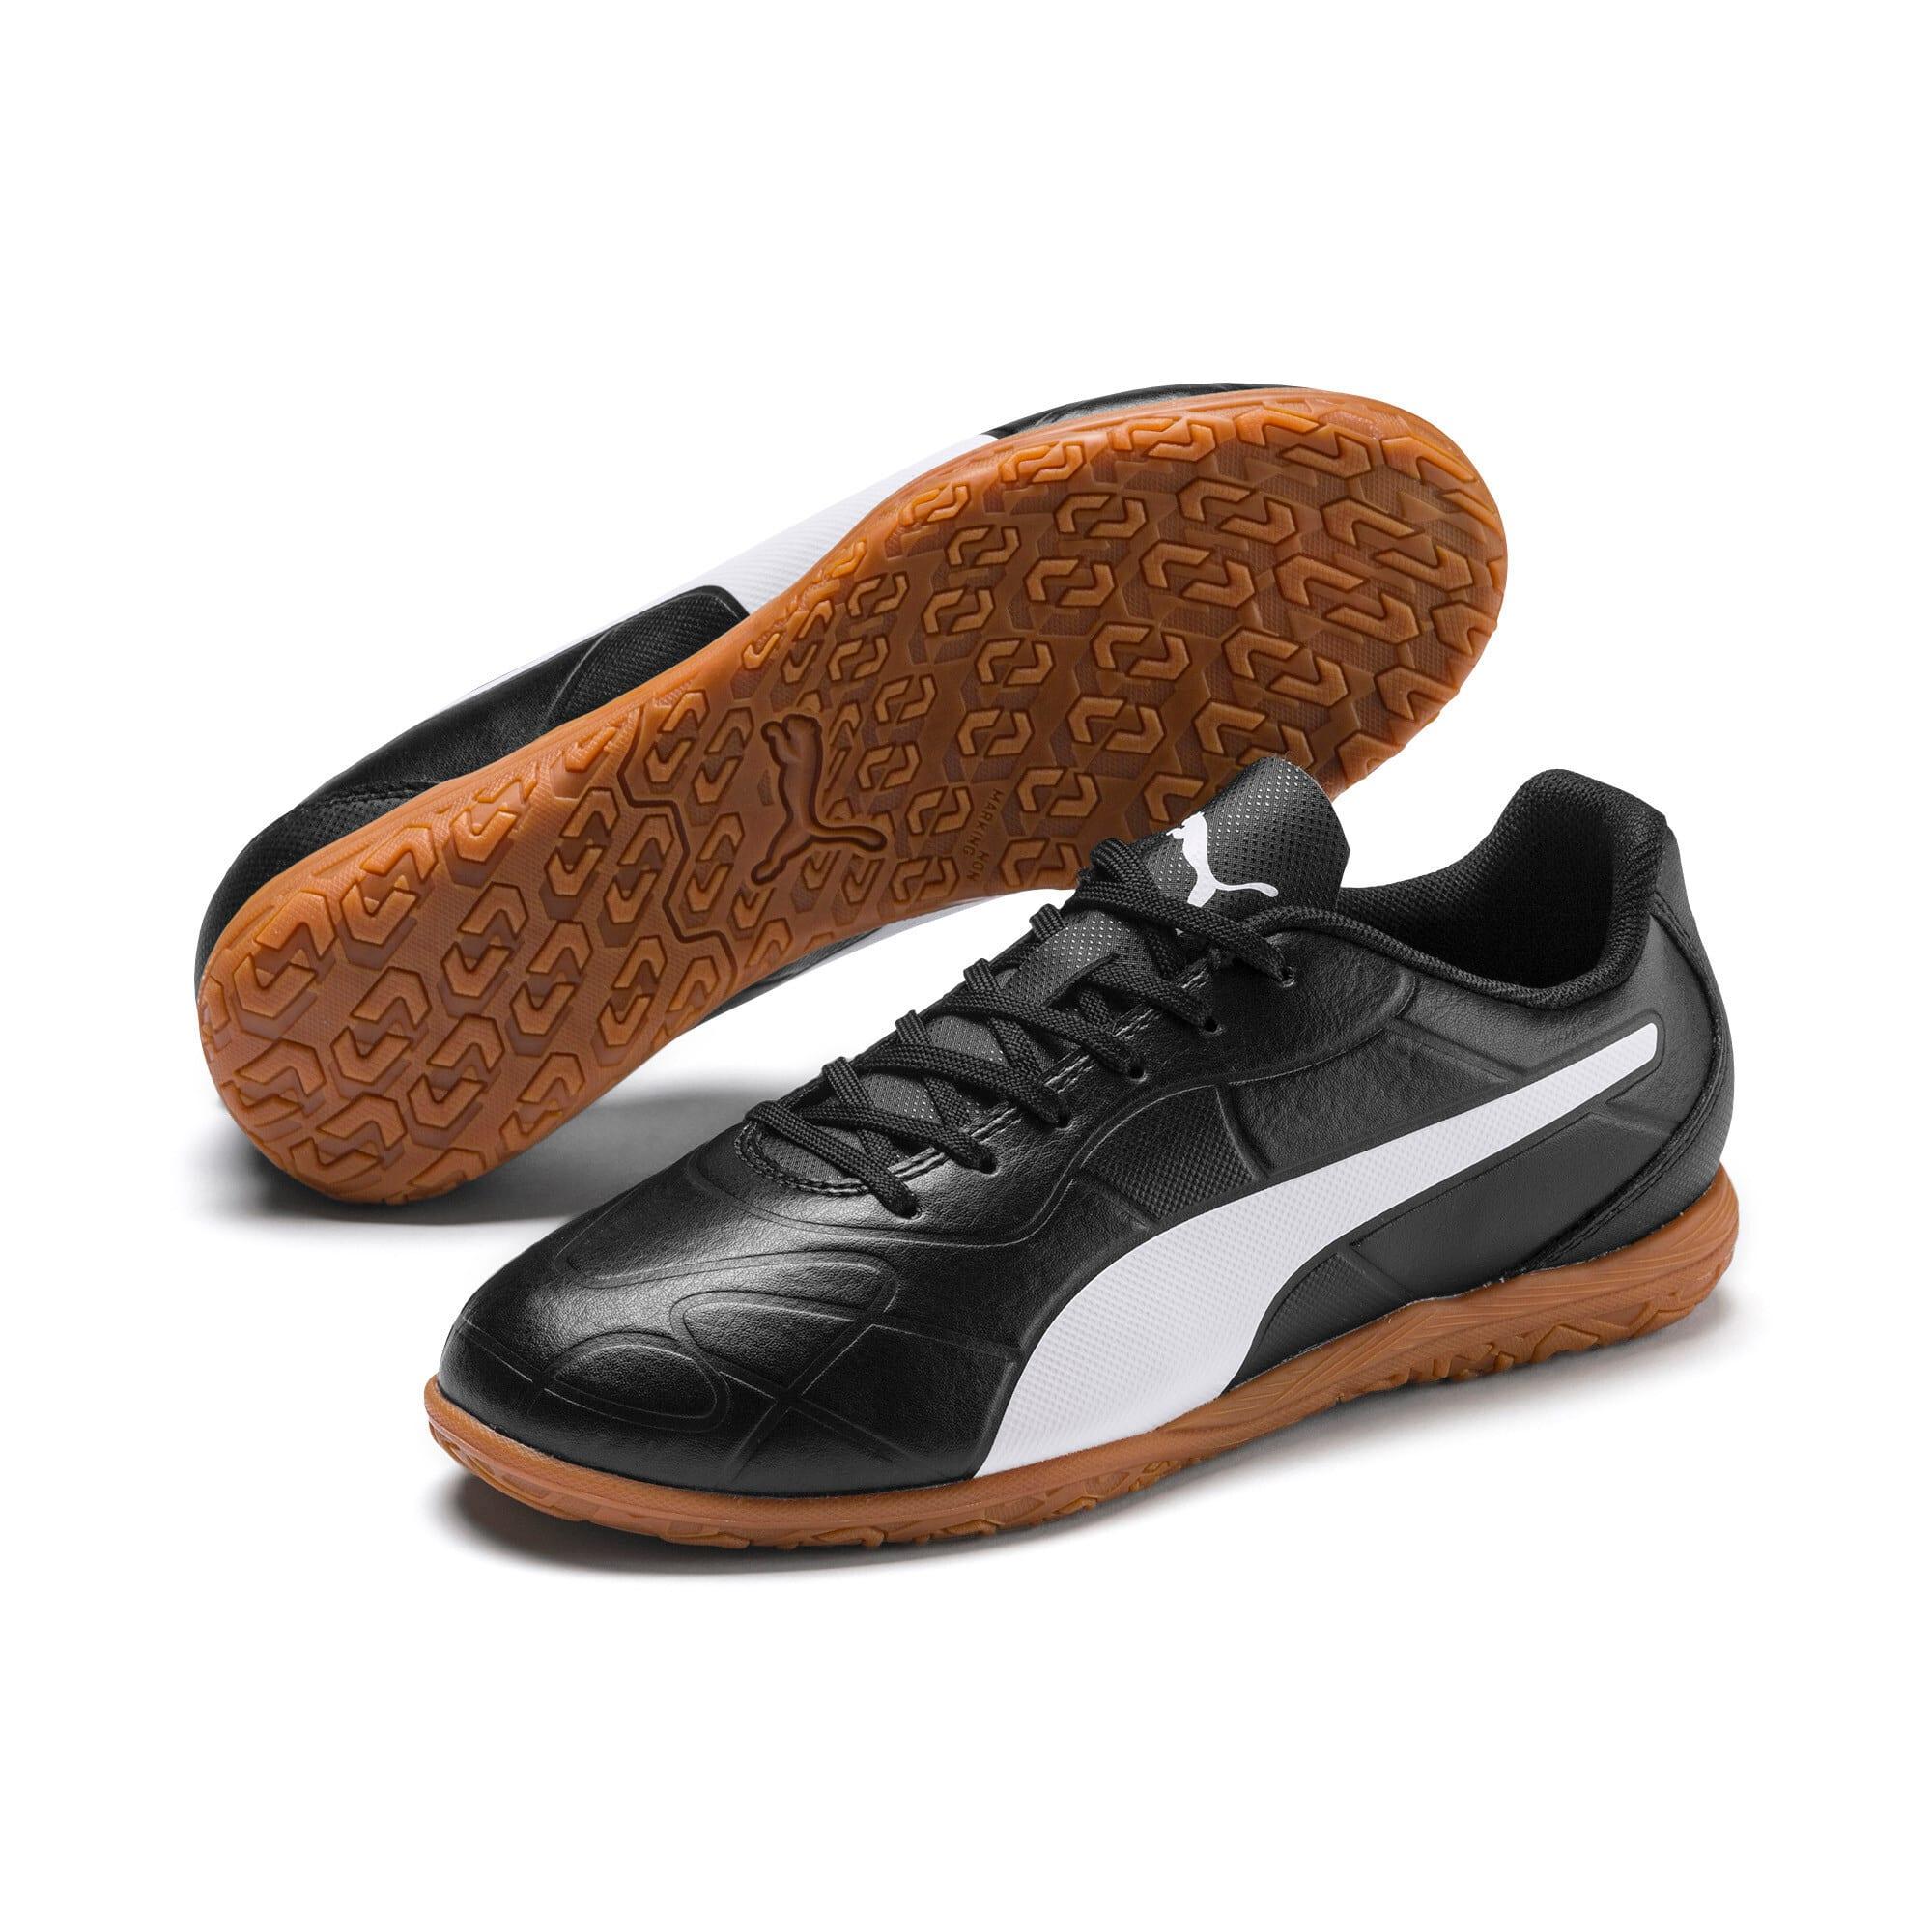 Thumbnail 6 of Monarch IT Youth Football Boot, Puma Black-Puma White, medium-IND